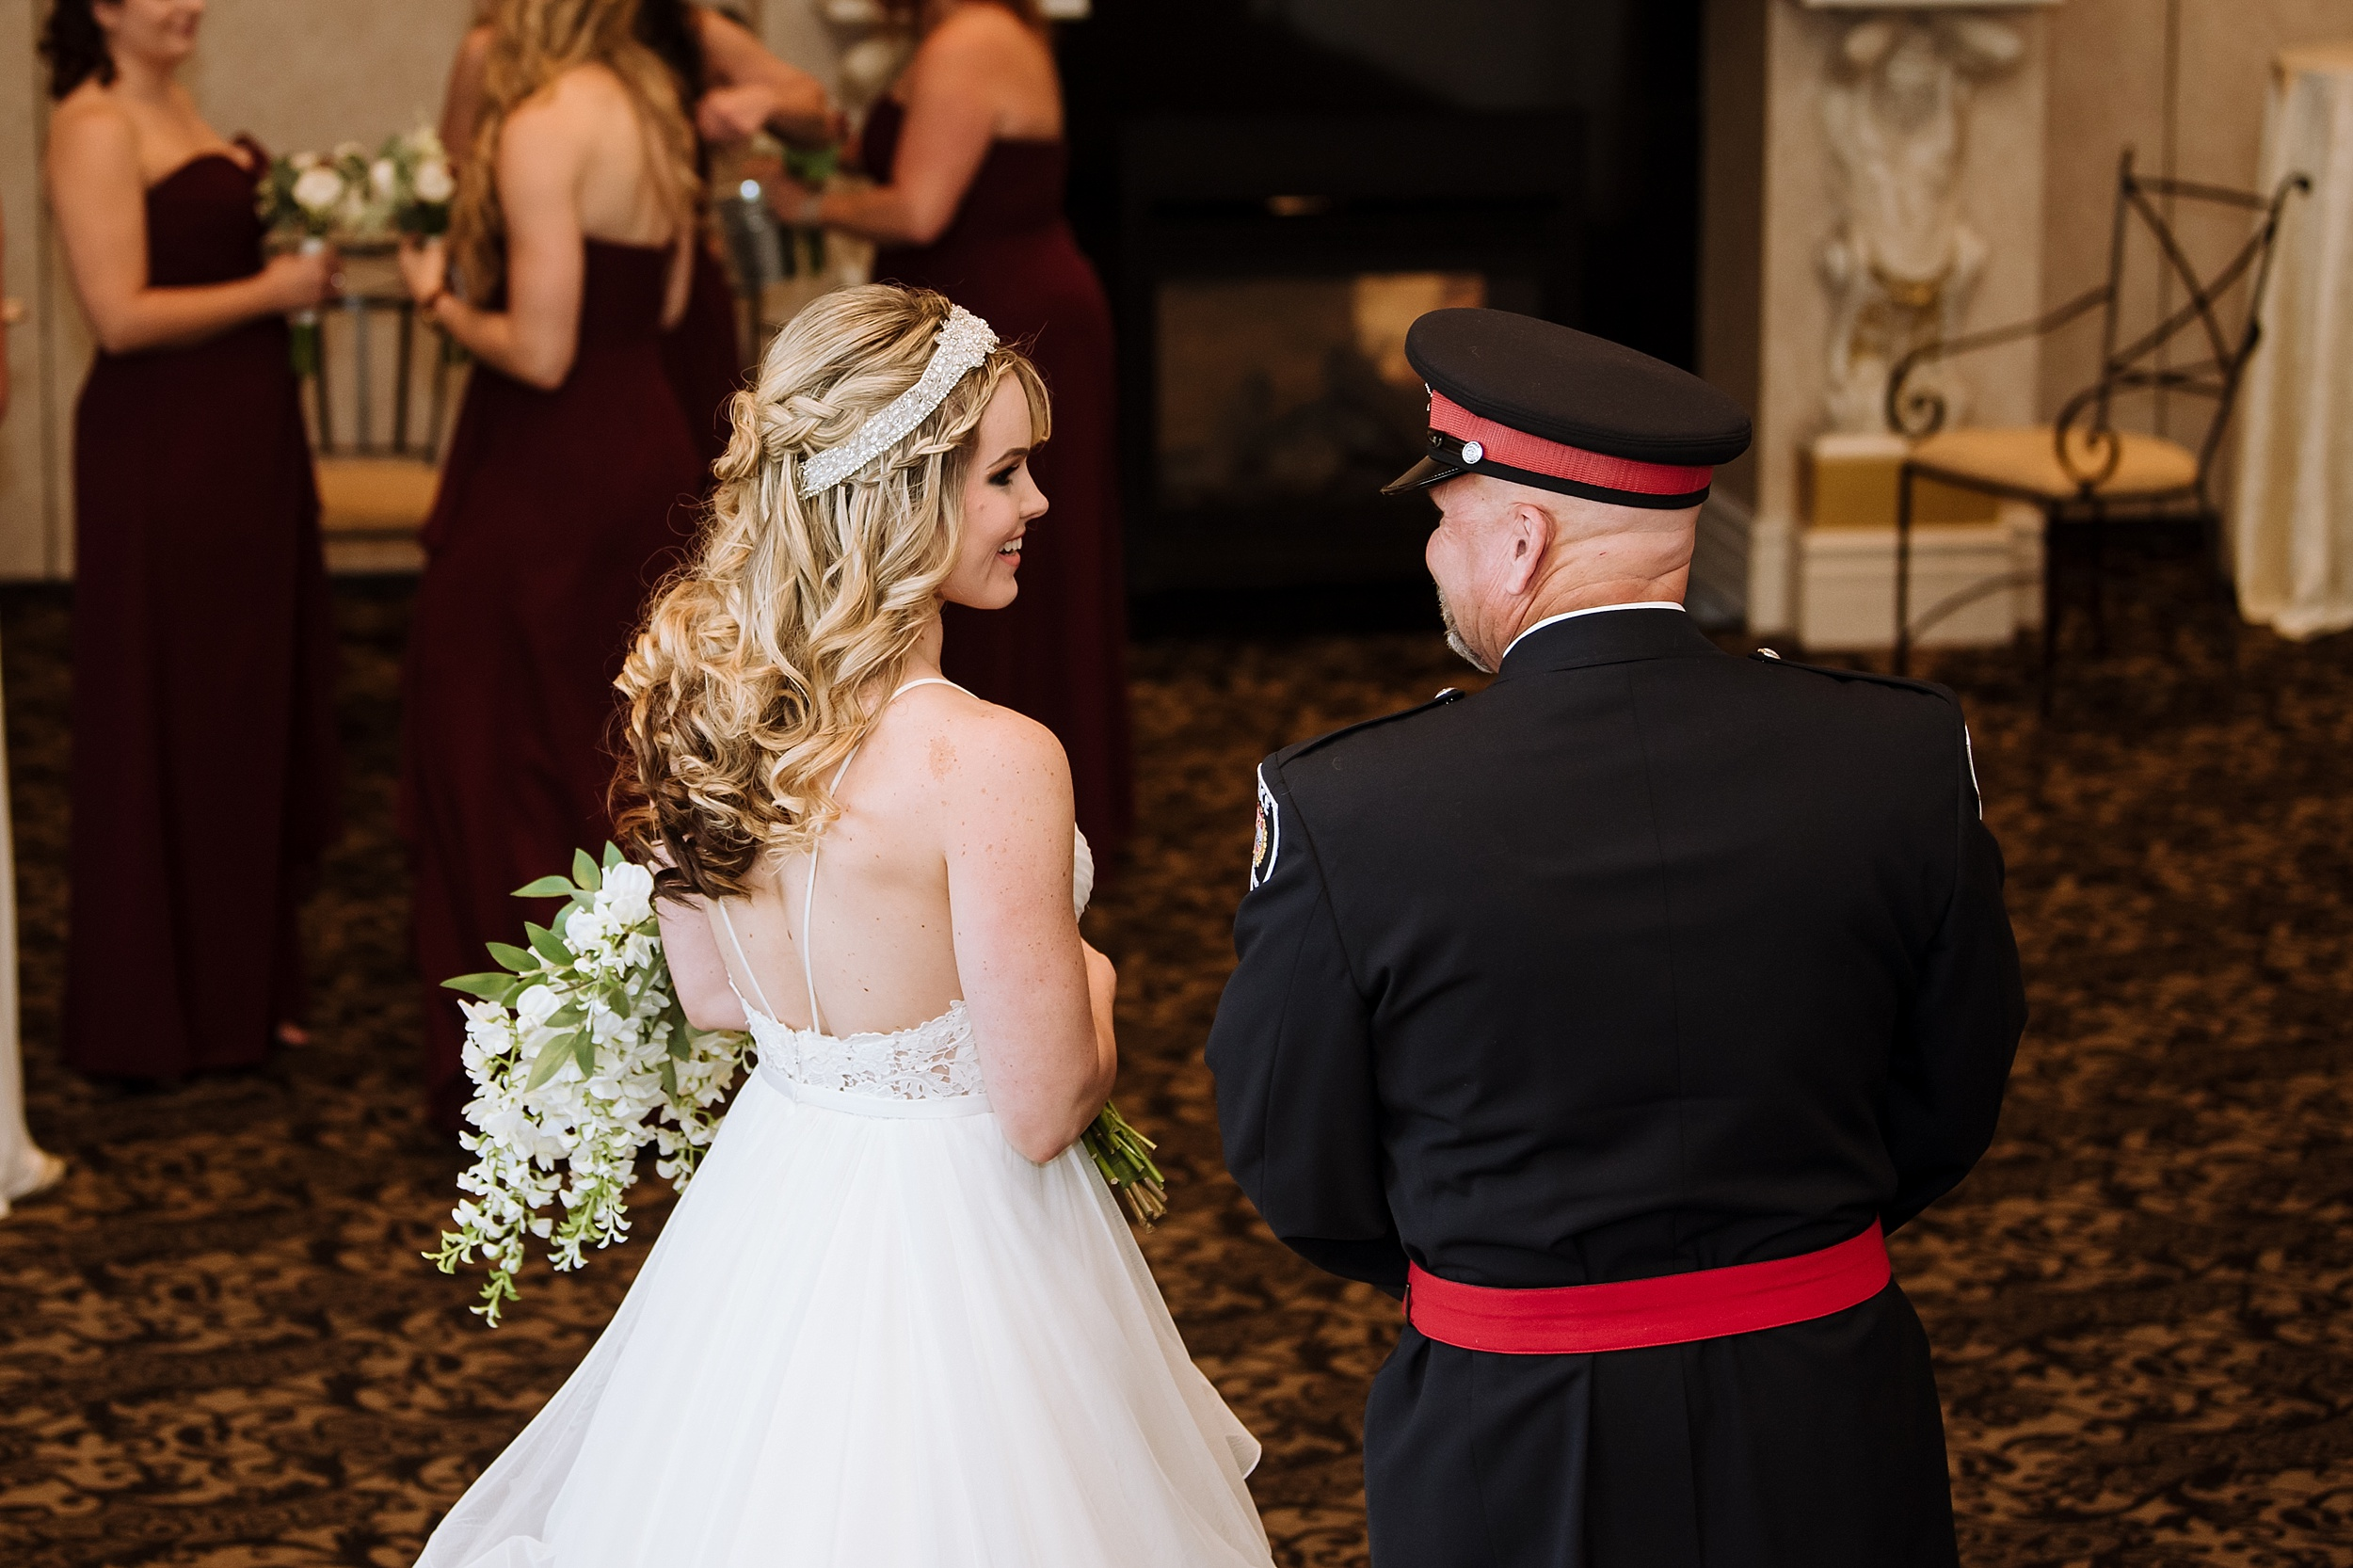 McMichael_Art_Collection_Wedding_chateau_le_jardin_Justine_Munro_Toronto_Photographer049.jpg